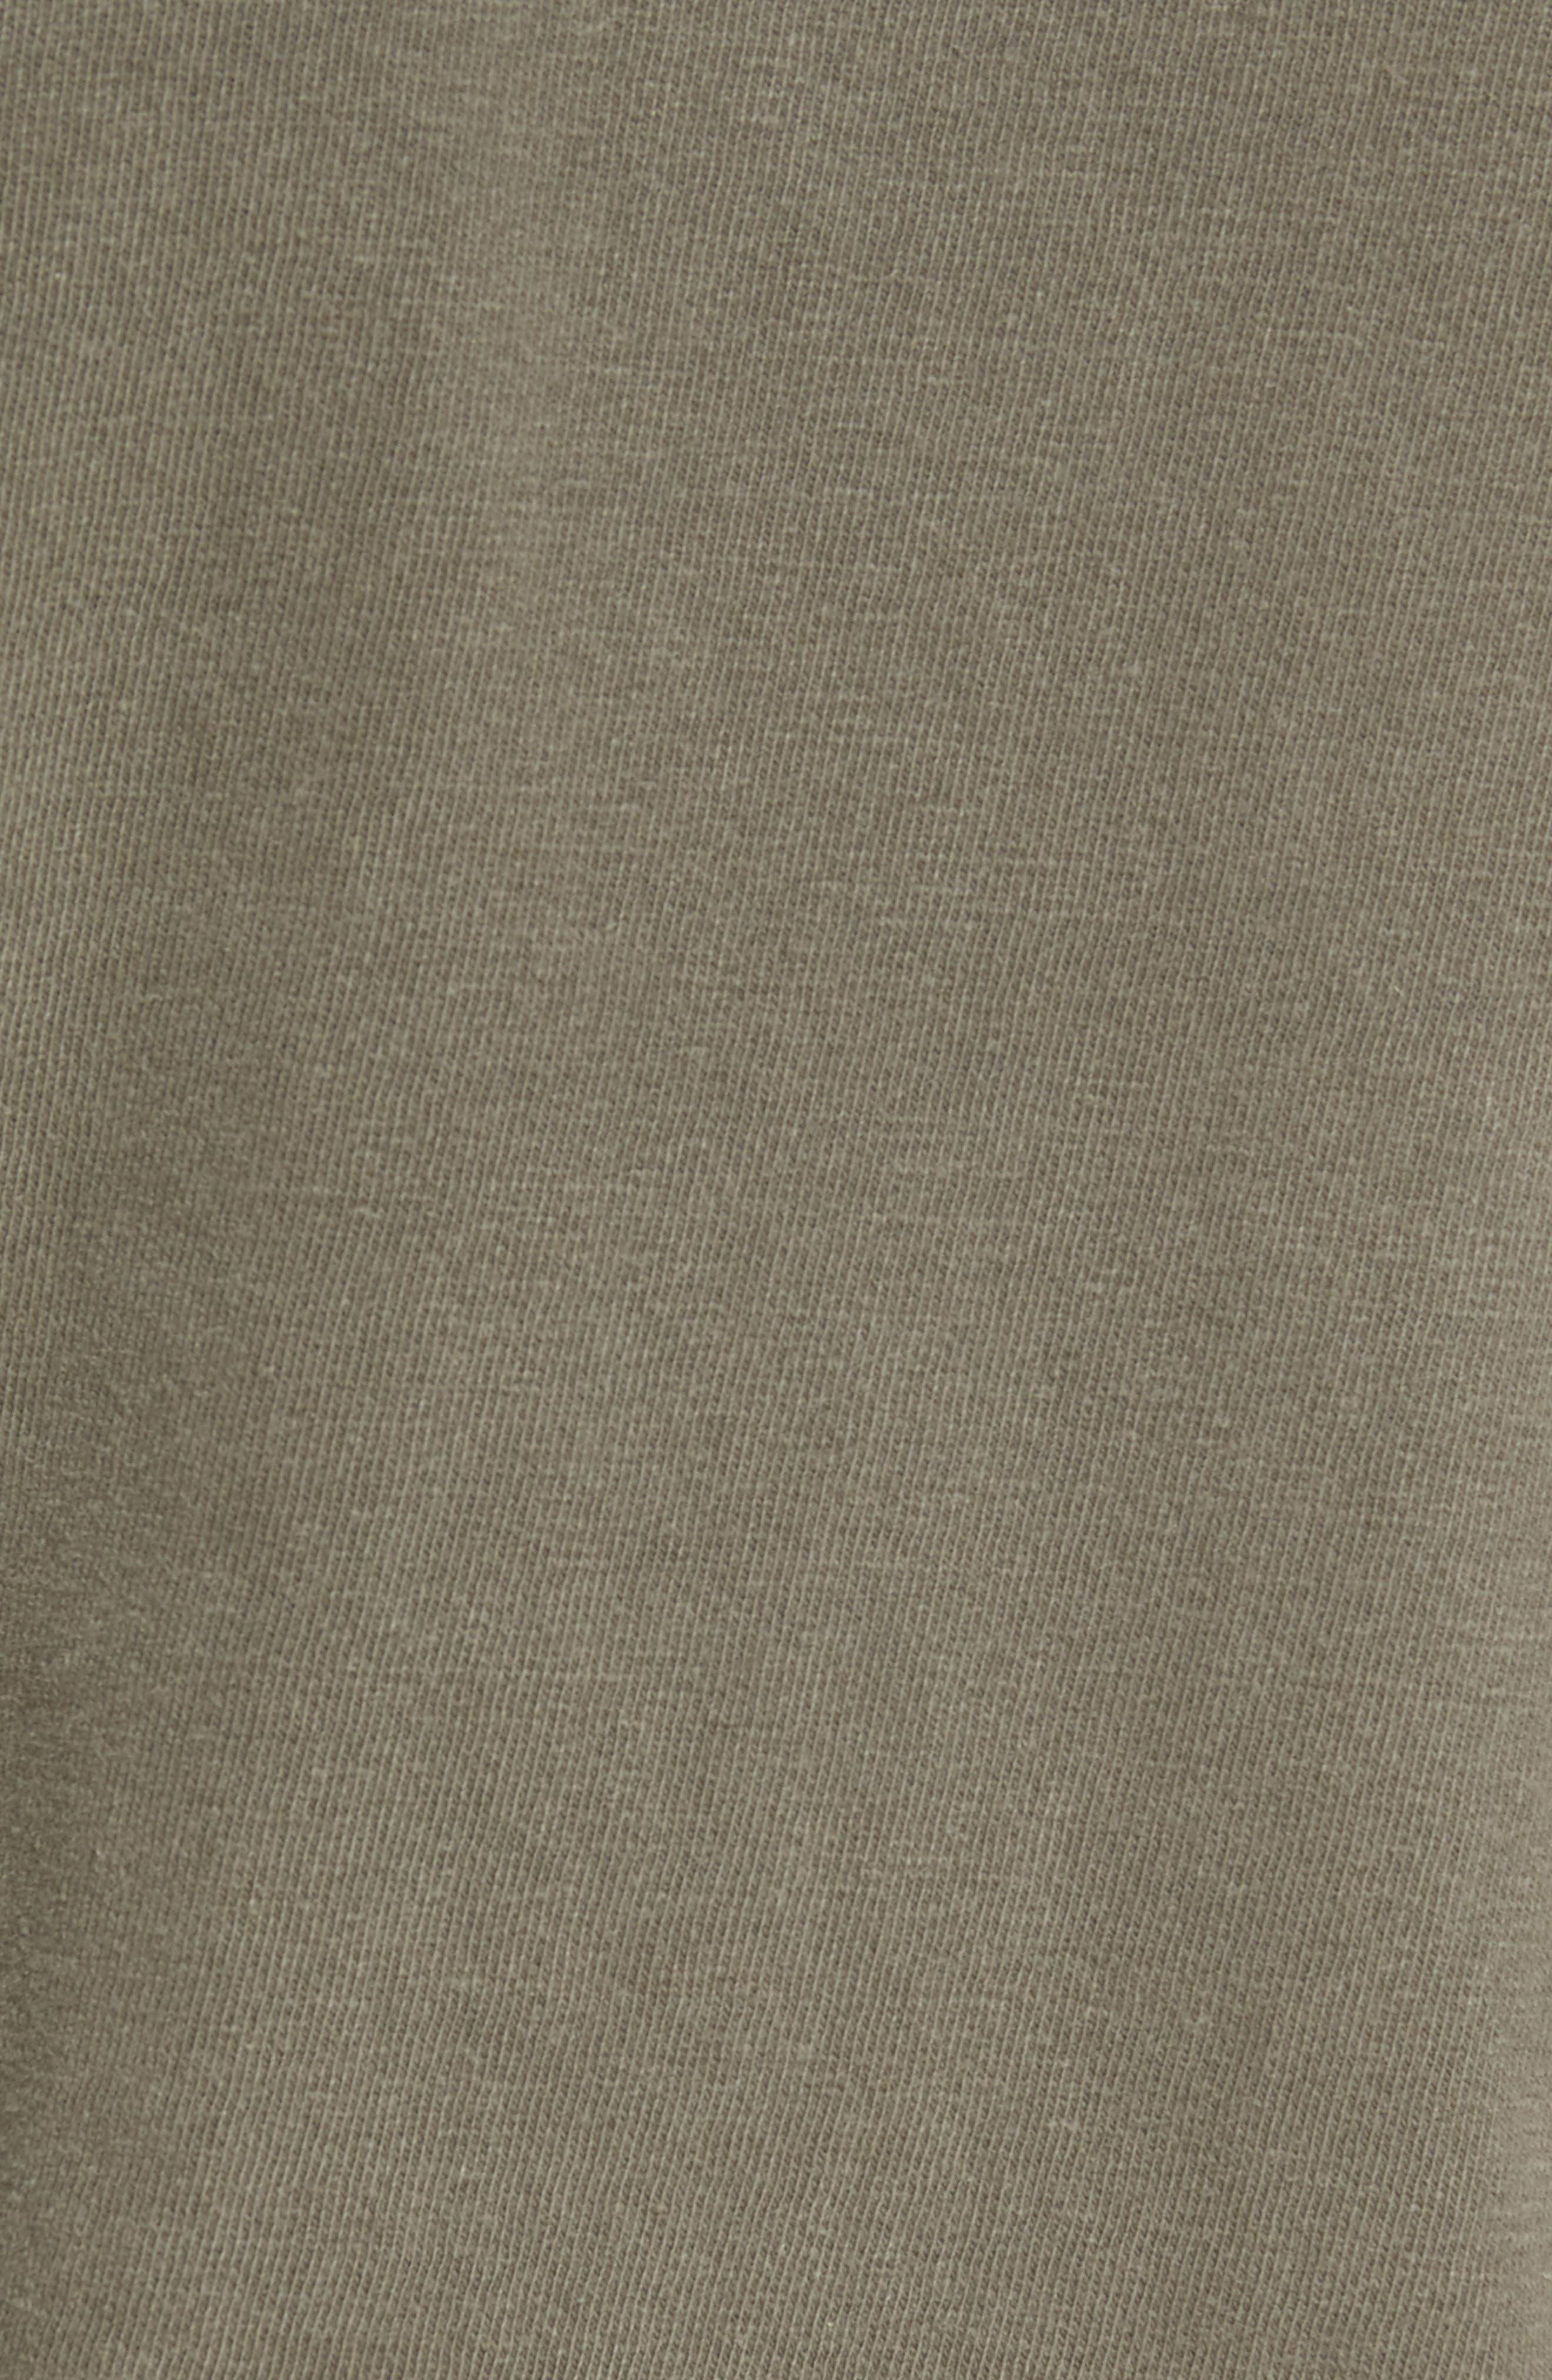 Long Sleeve Henley T-Shirt,                             Alternate thumbnail 14, color,